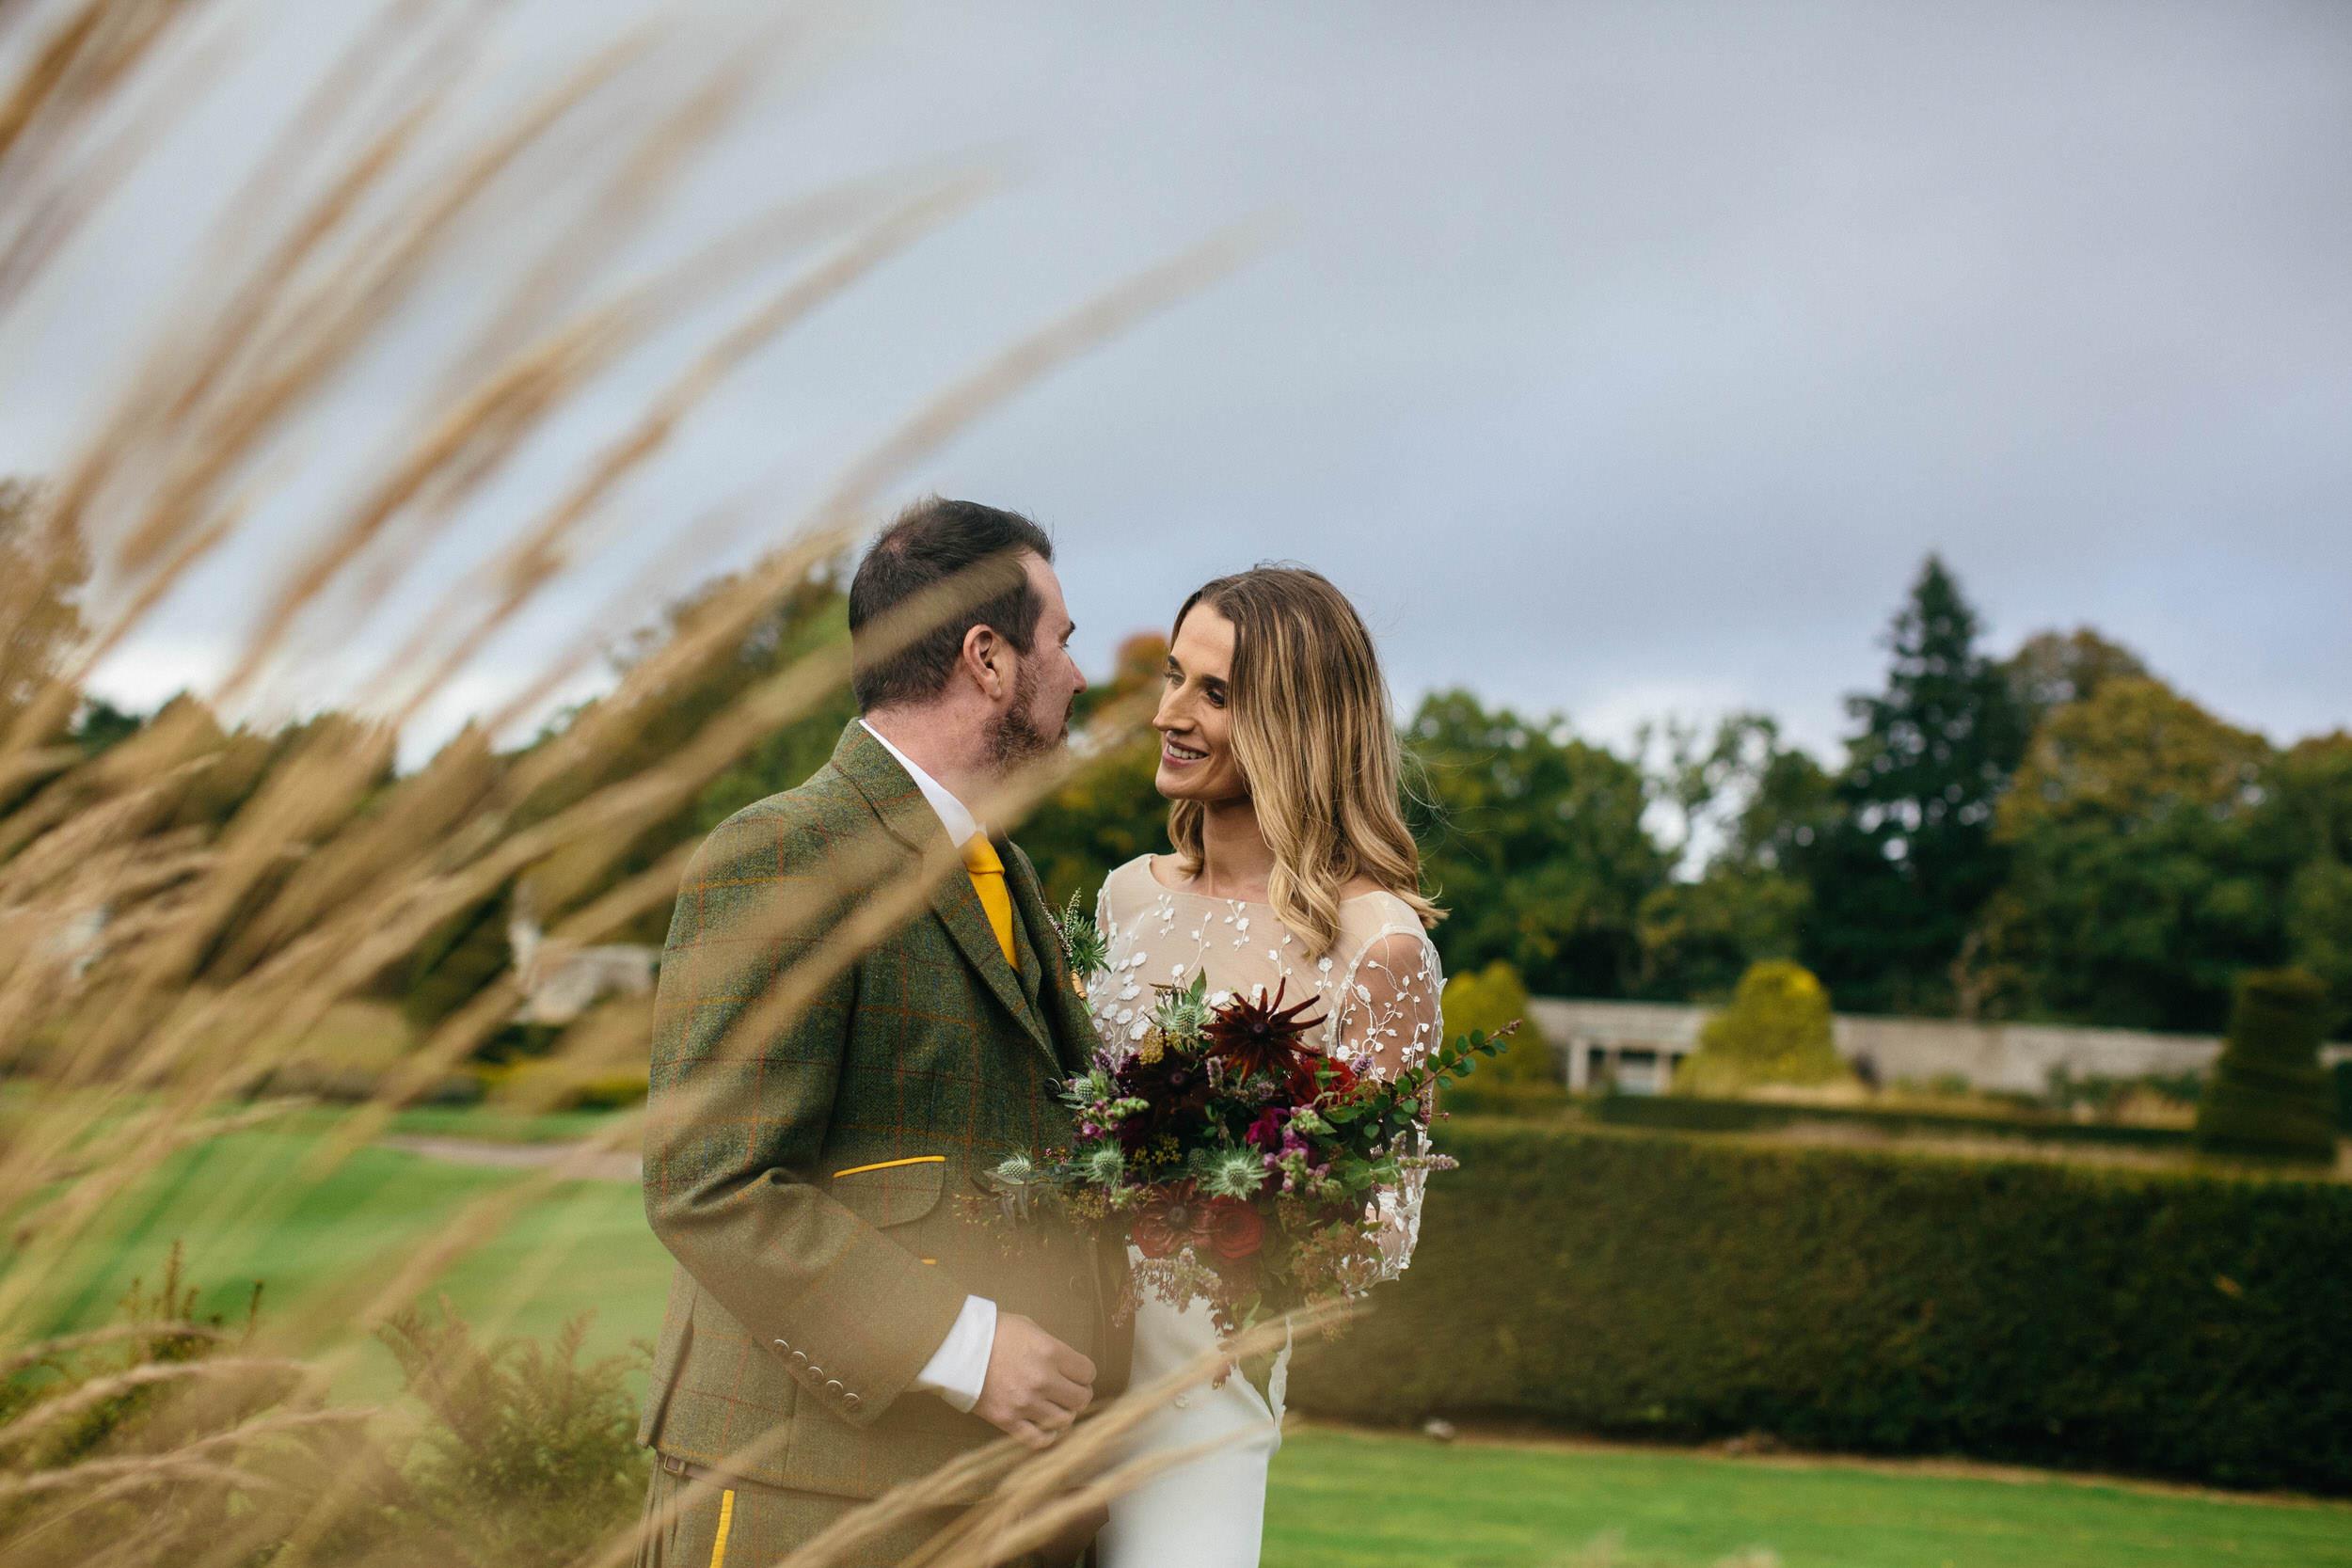 Quirky Wedding Photographer Scotland Glasgow Edinburgh Mirrorbox 140.jpg